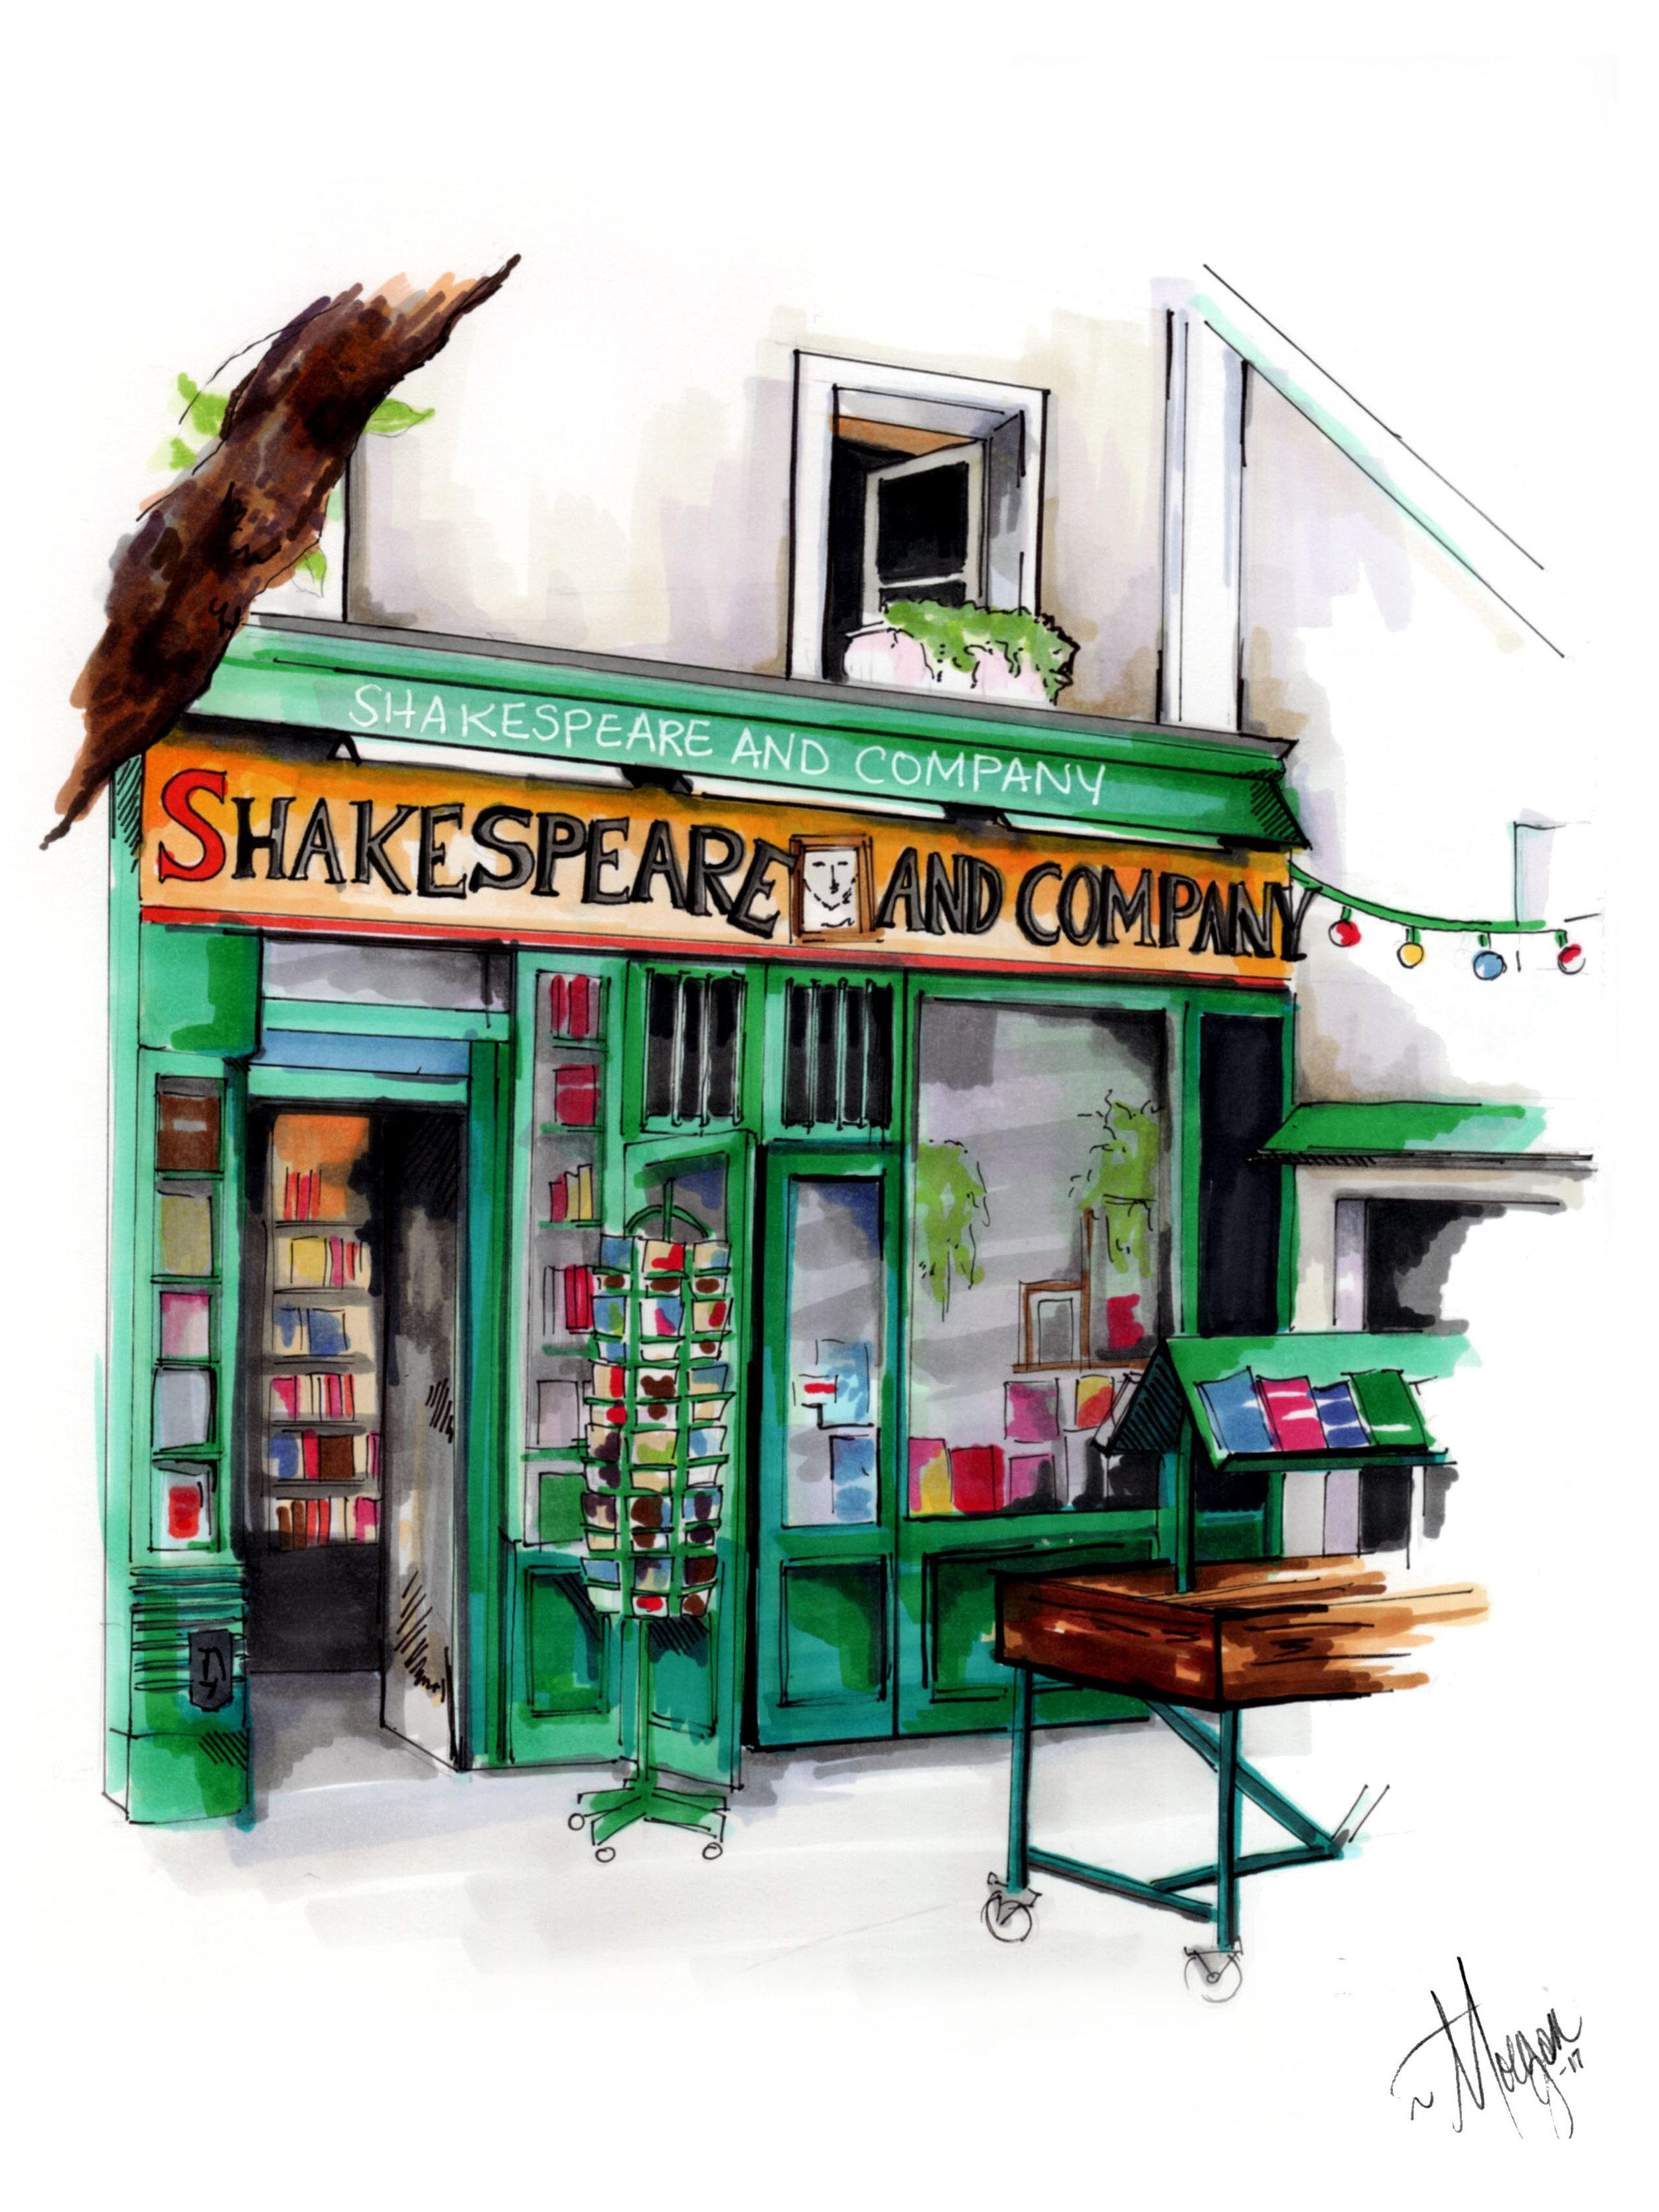 Shakespeare-and-co-illustration-morgan-swank-studio.jpg